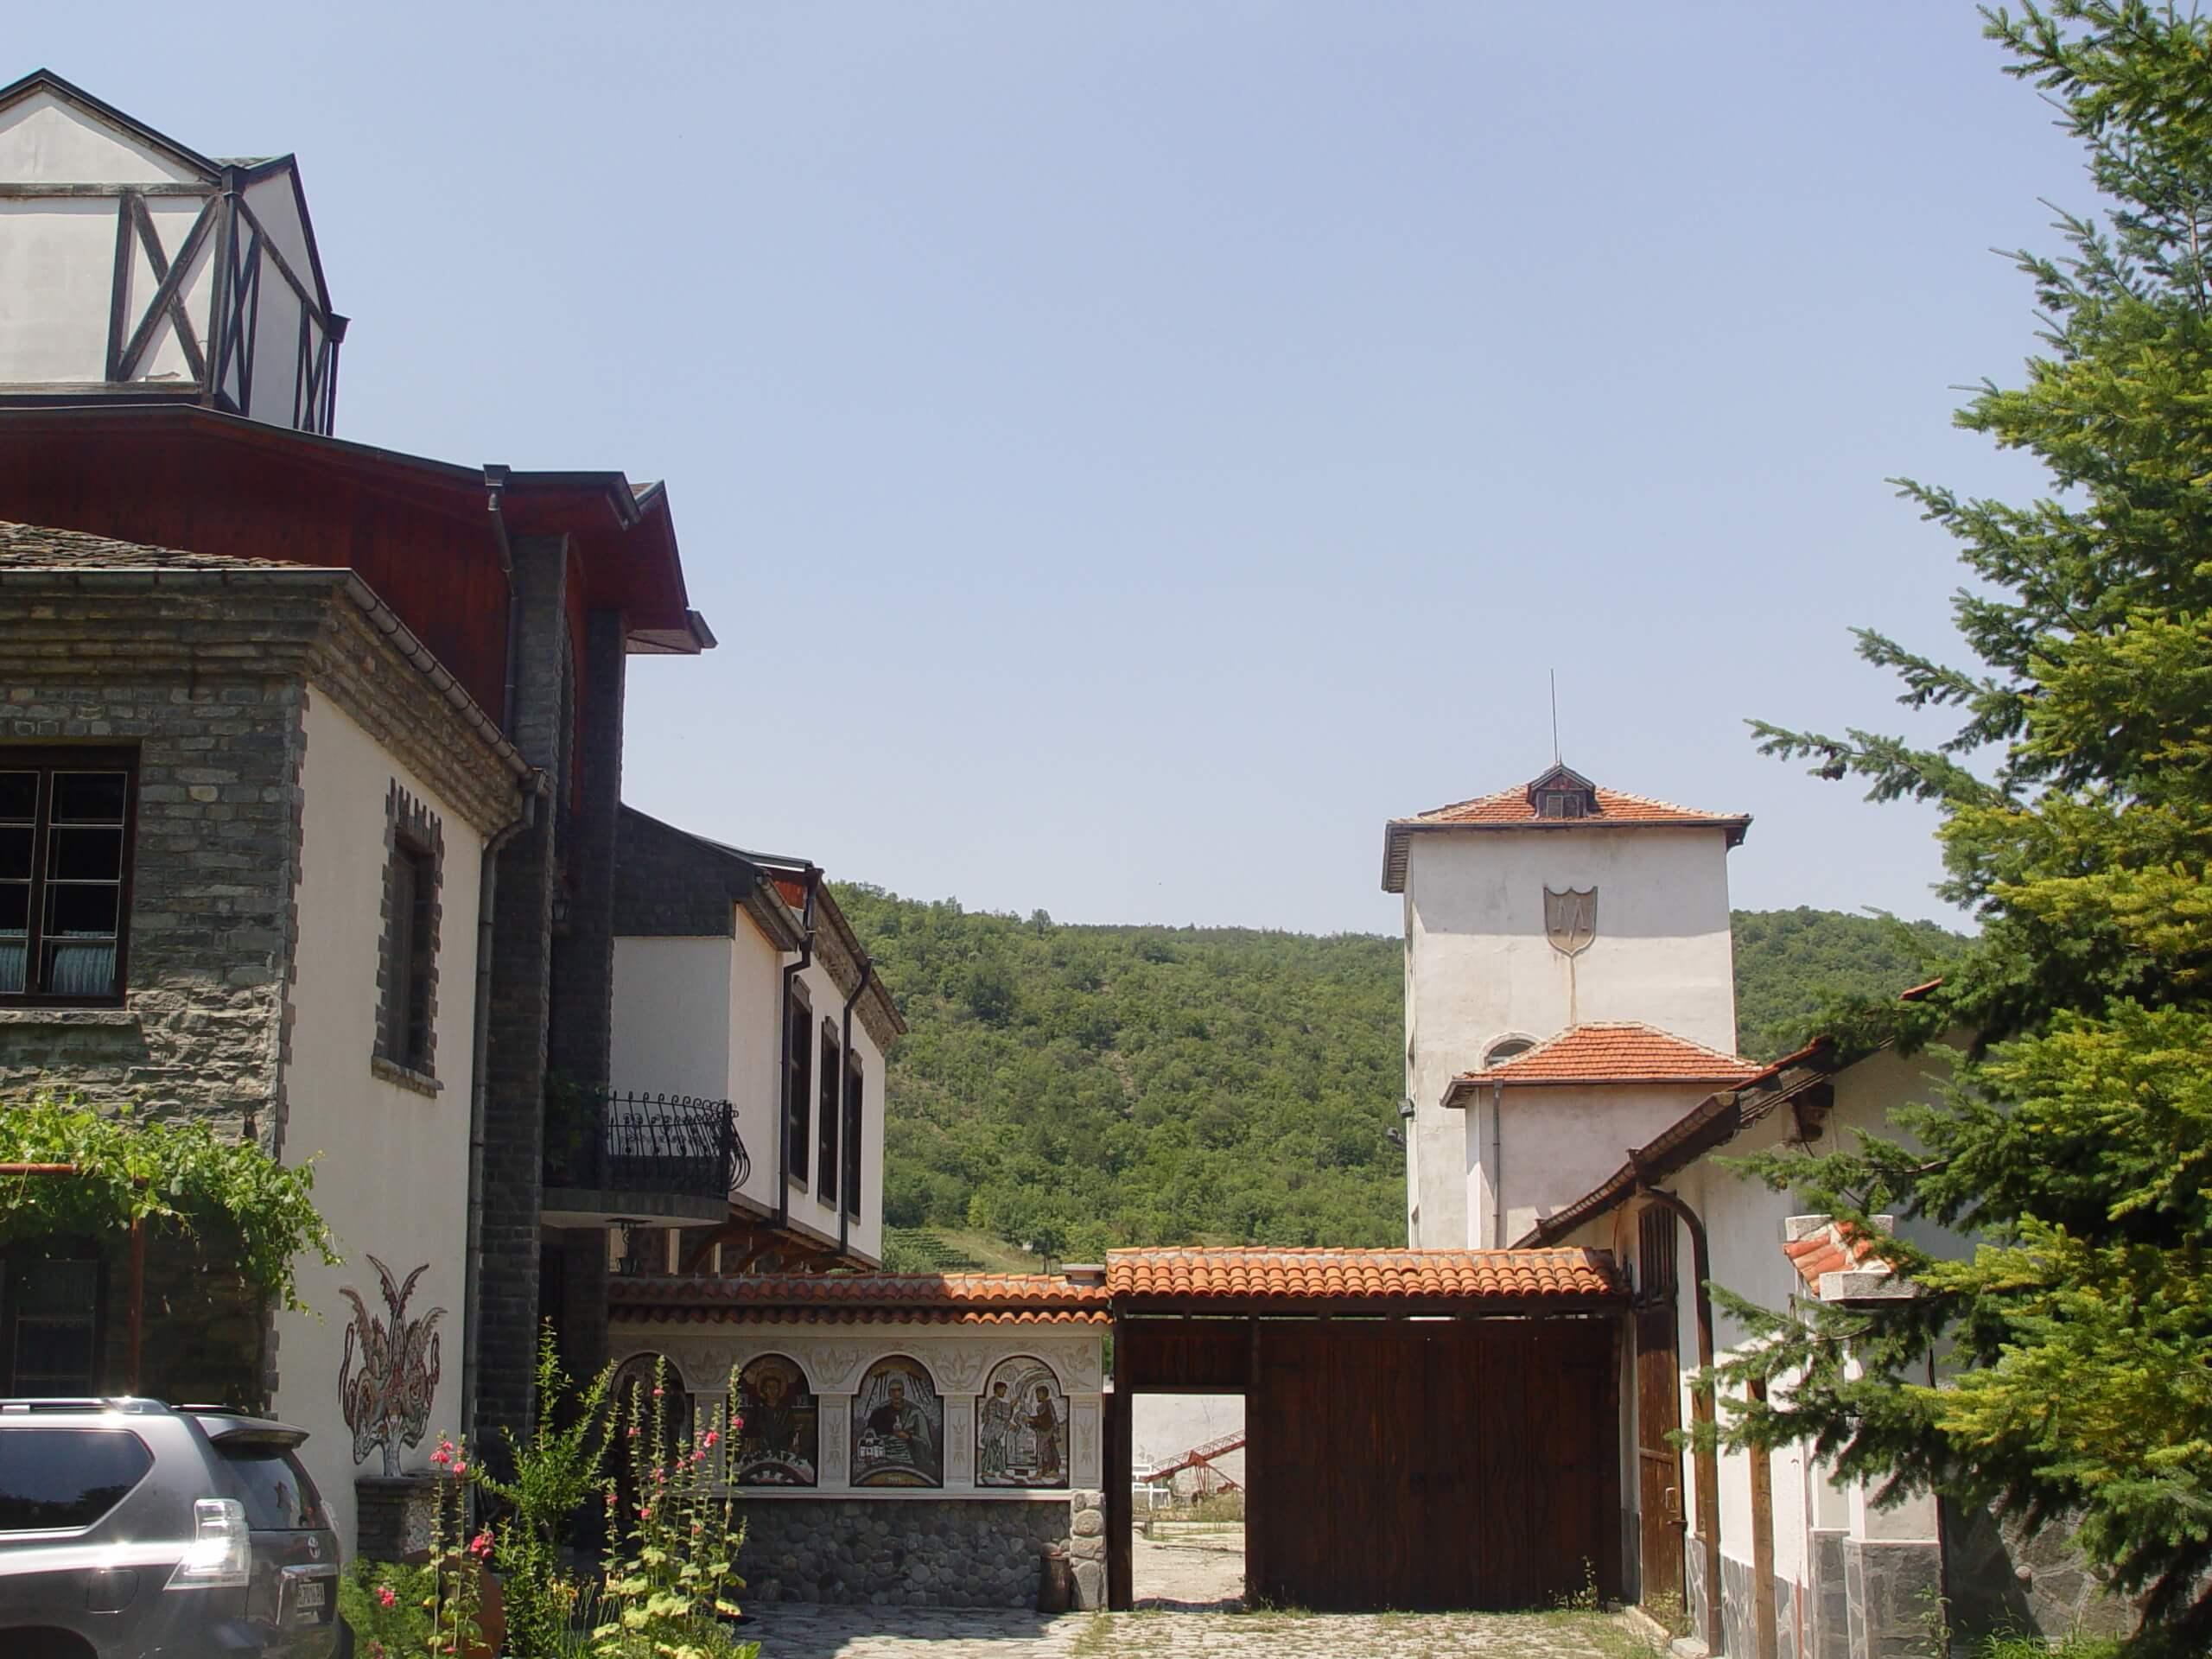 Starata Izba Parvenetz [Old Cellar Parvenetz], 19th century wine cellar